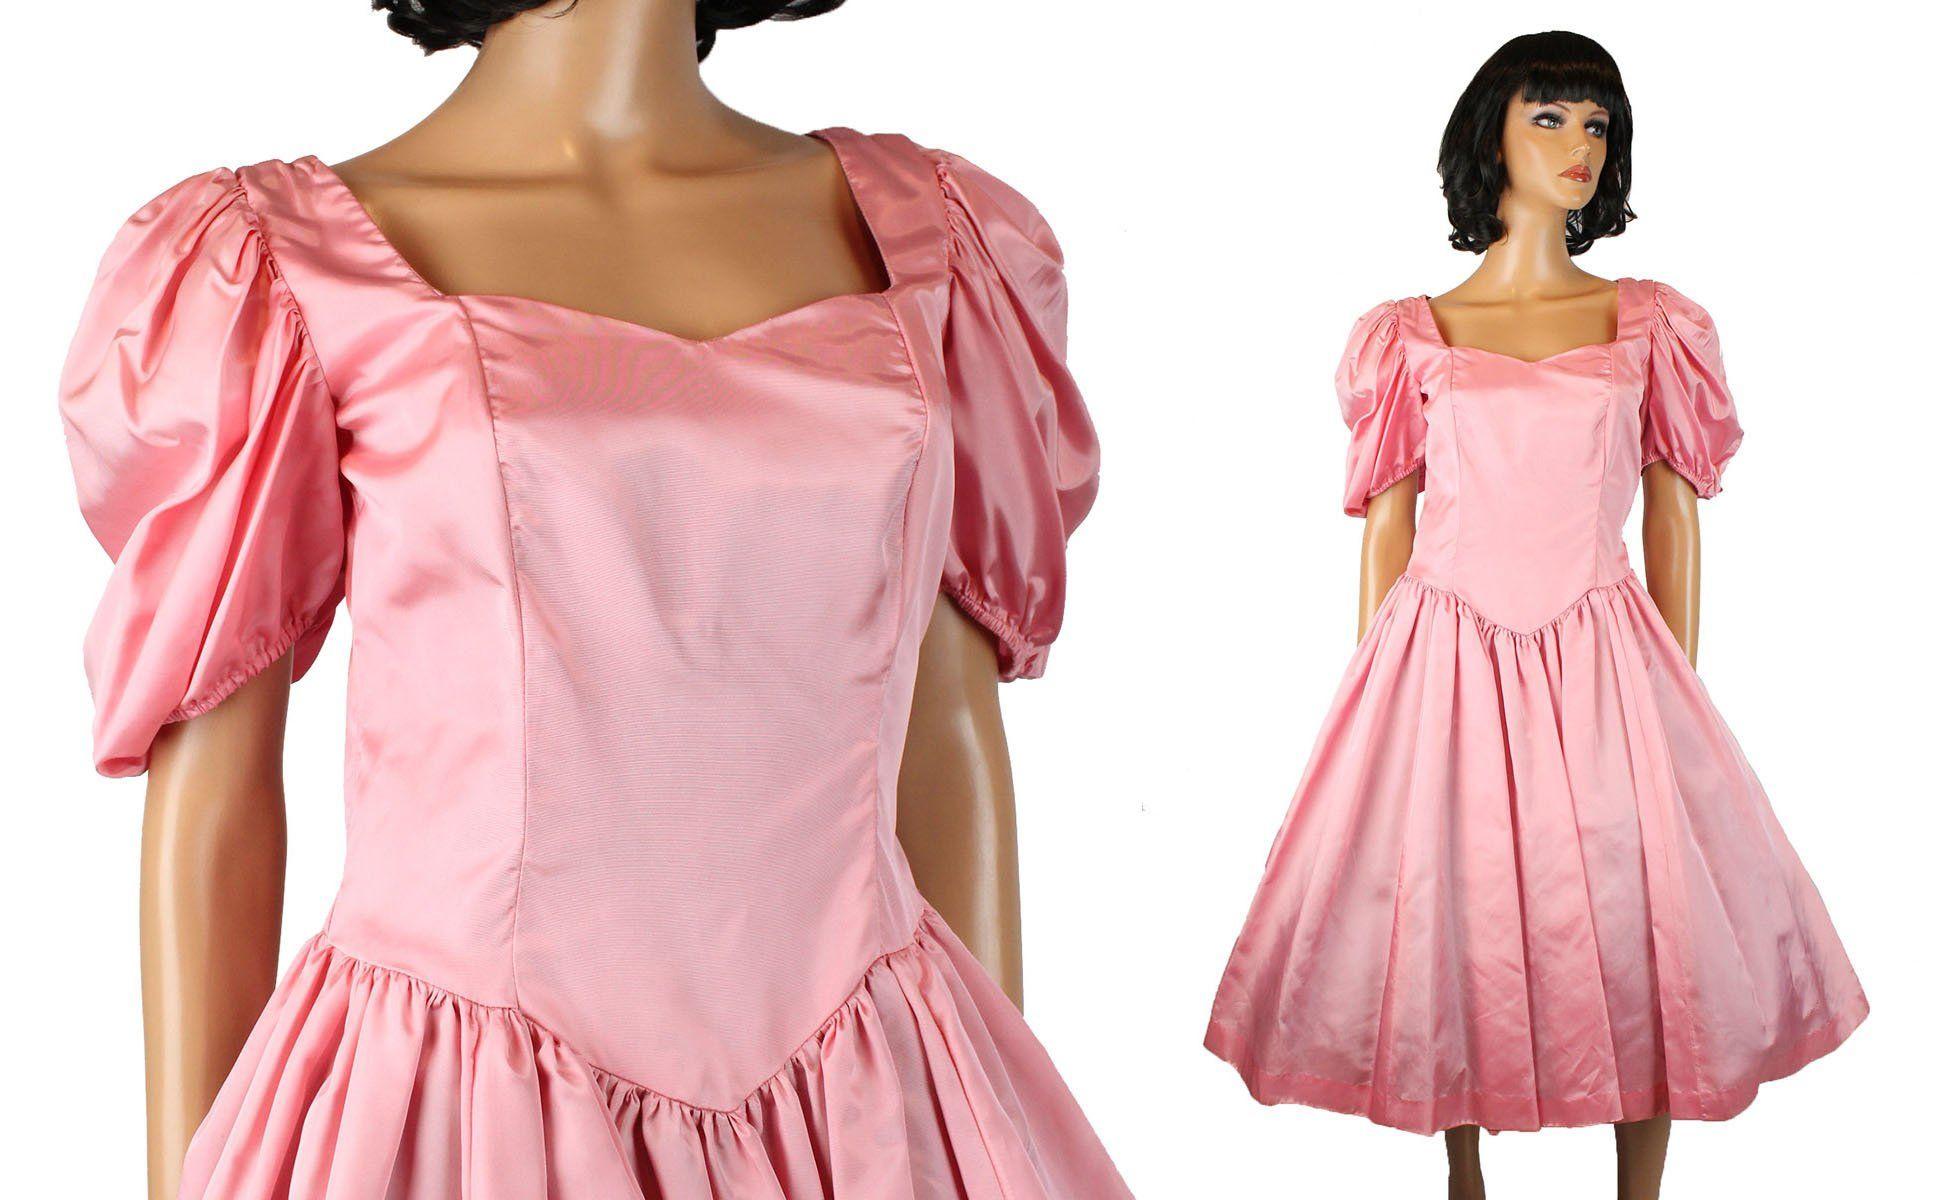 S prom dress sz m vintage bubblegum pink taffeta short sleeve